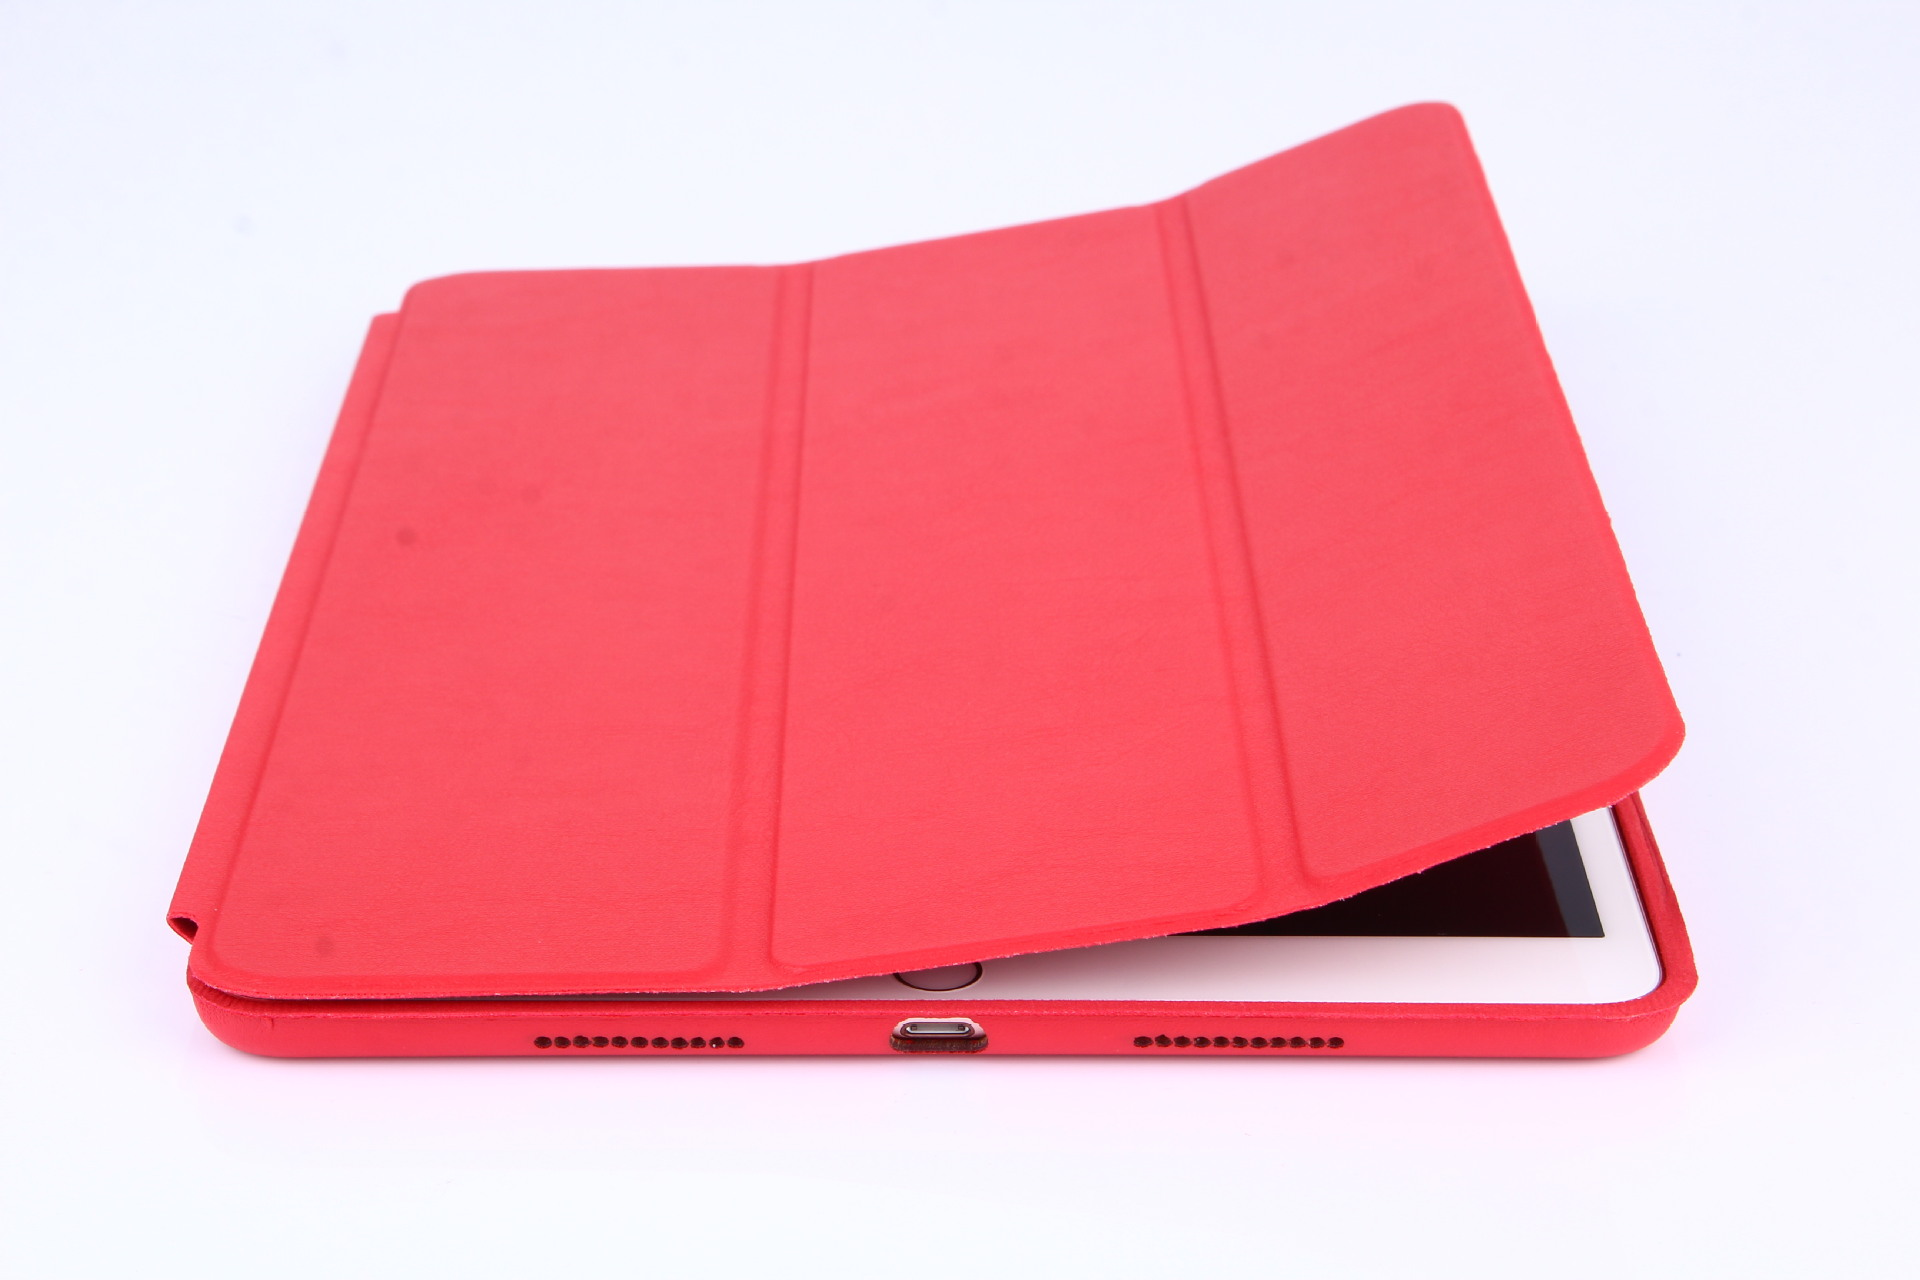 iPad平板电脑10.2保护套三折超薄外壳防摔皮套case配件支架全包边